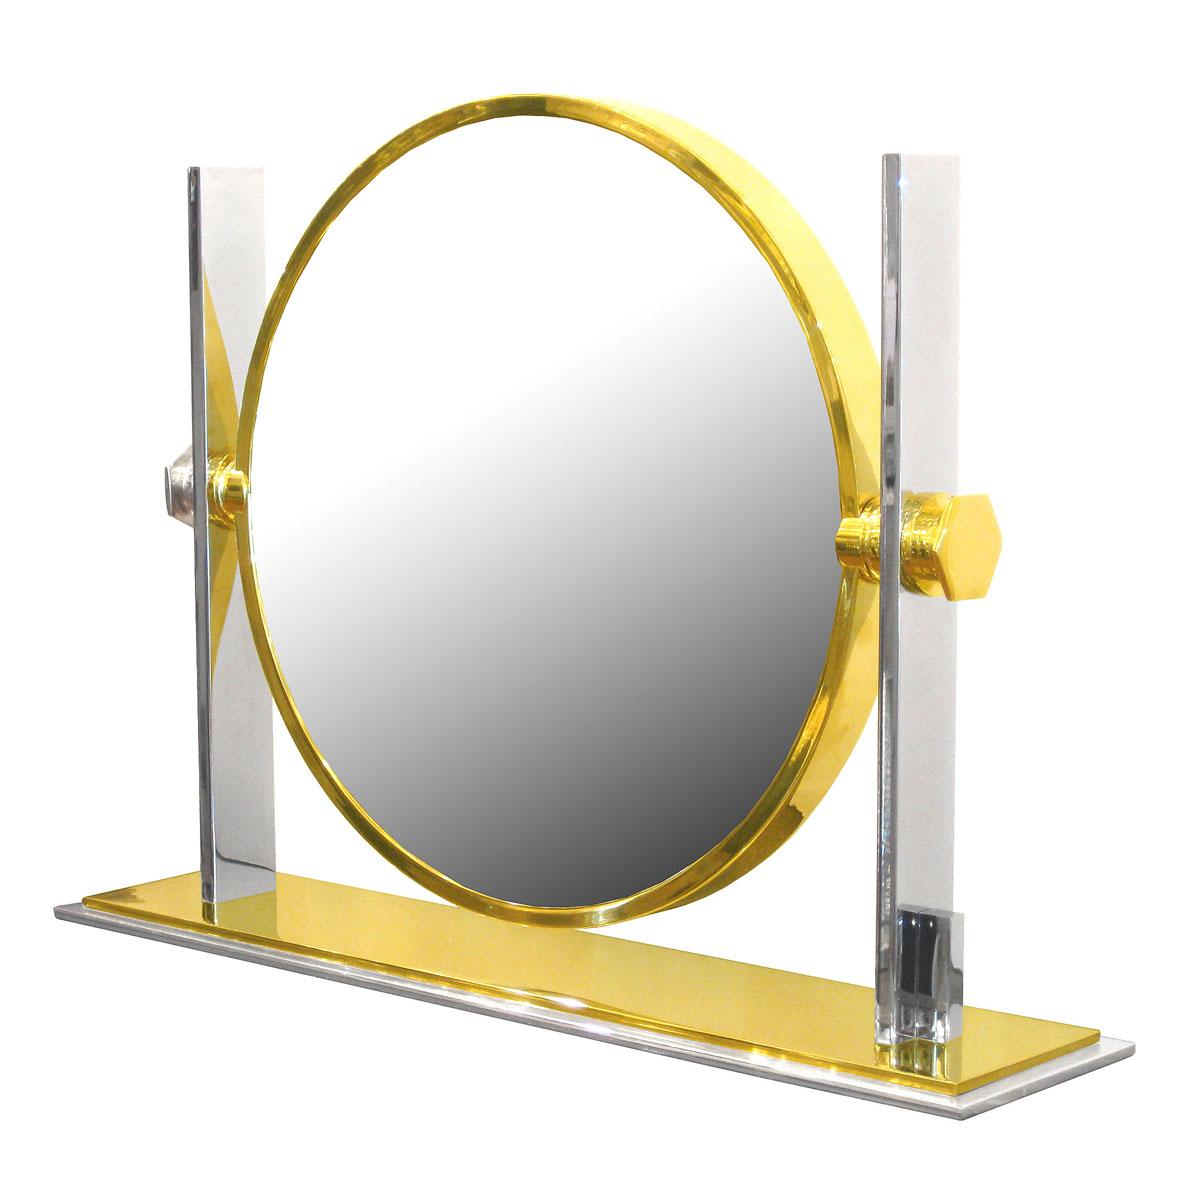 Rare Chrome And Brass Vanity Mirror By Karl Springer Vanity John Salibello